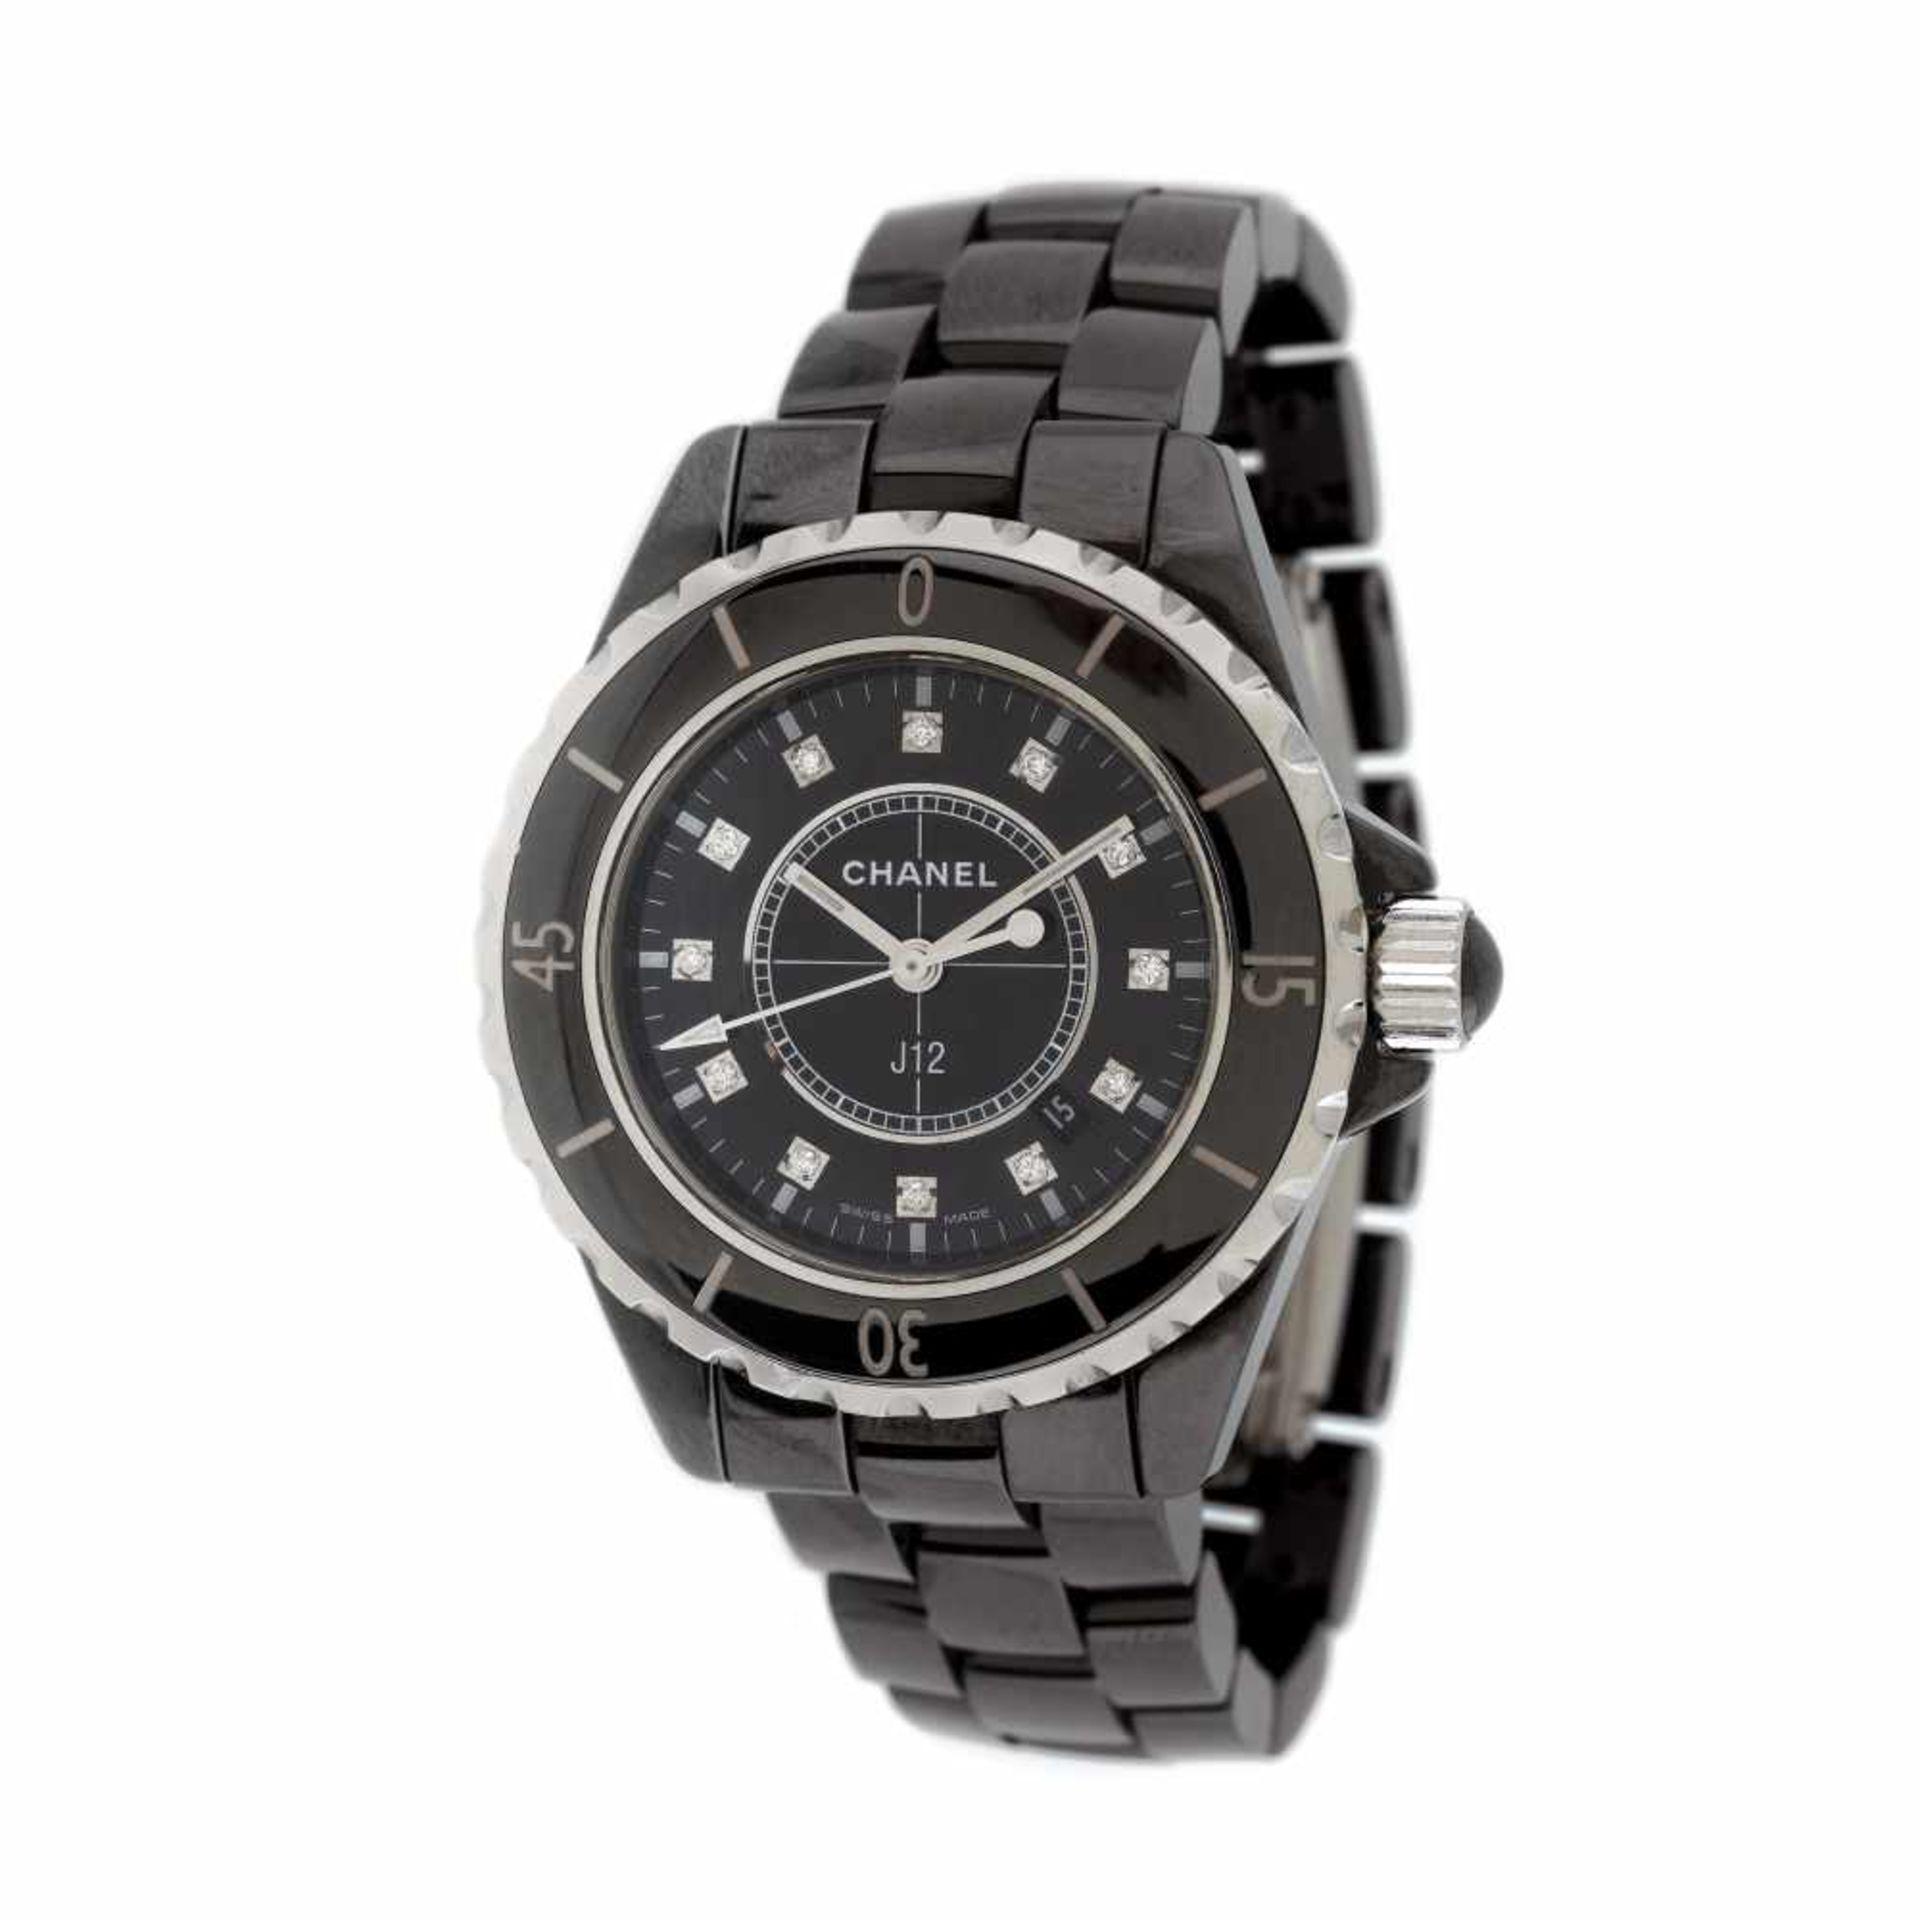 Chanel bracelet watch, women, decorated with diamonds